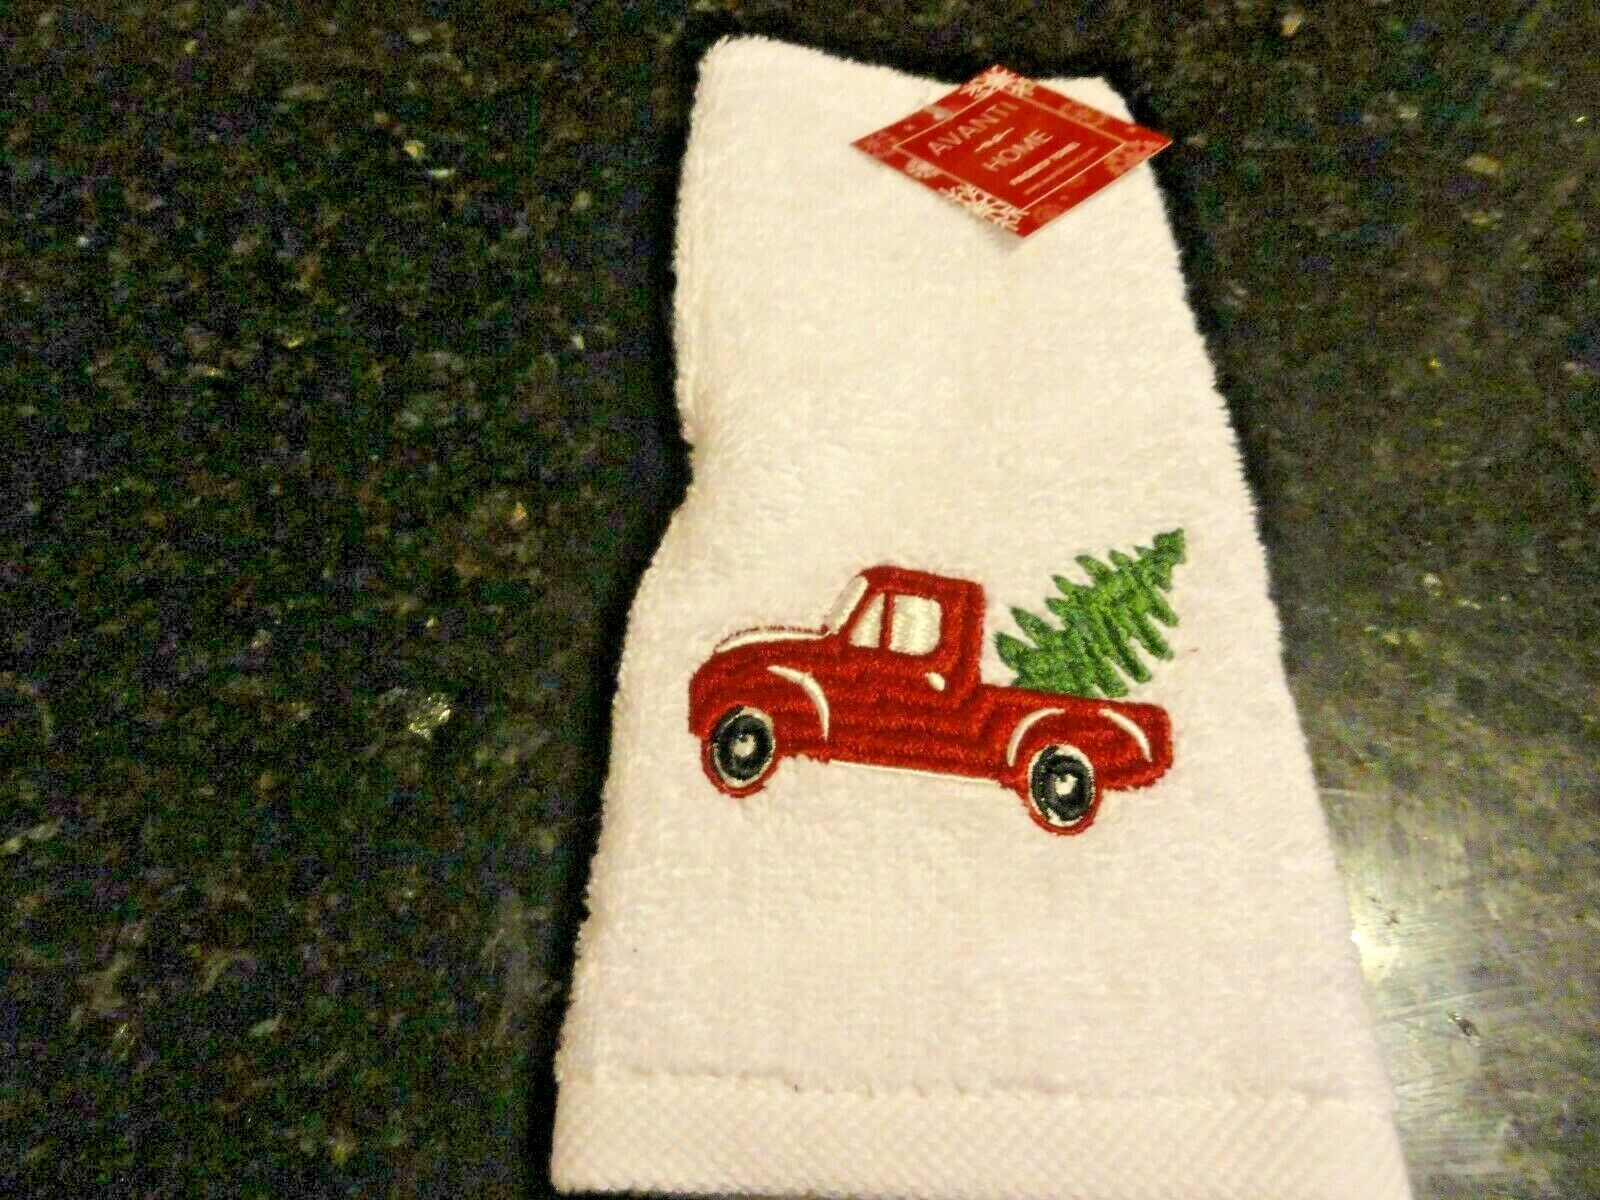 1 New Truck Christmas Trees Cut & Carry Spruce burgundy white fingertip Towel